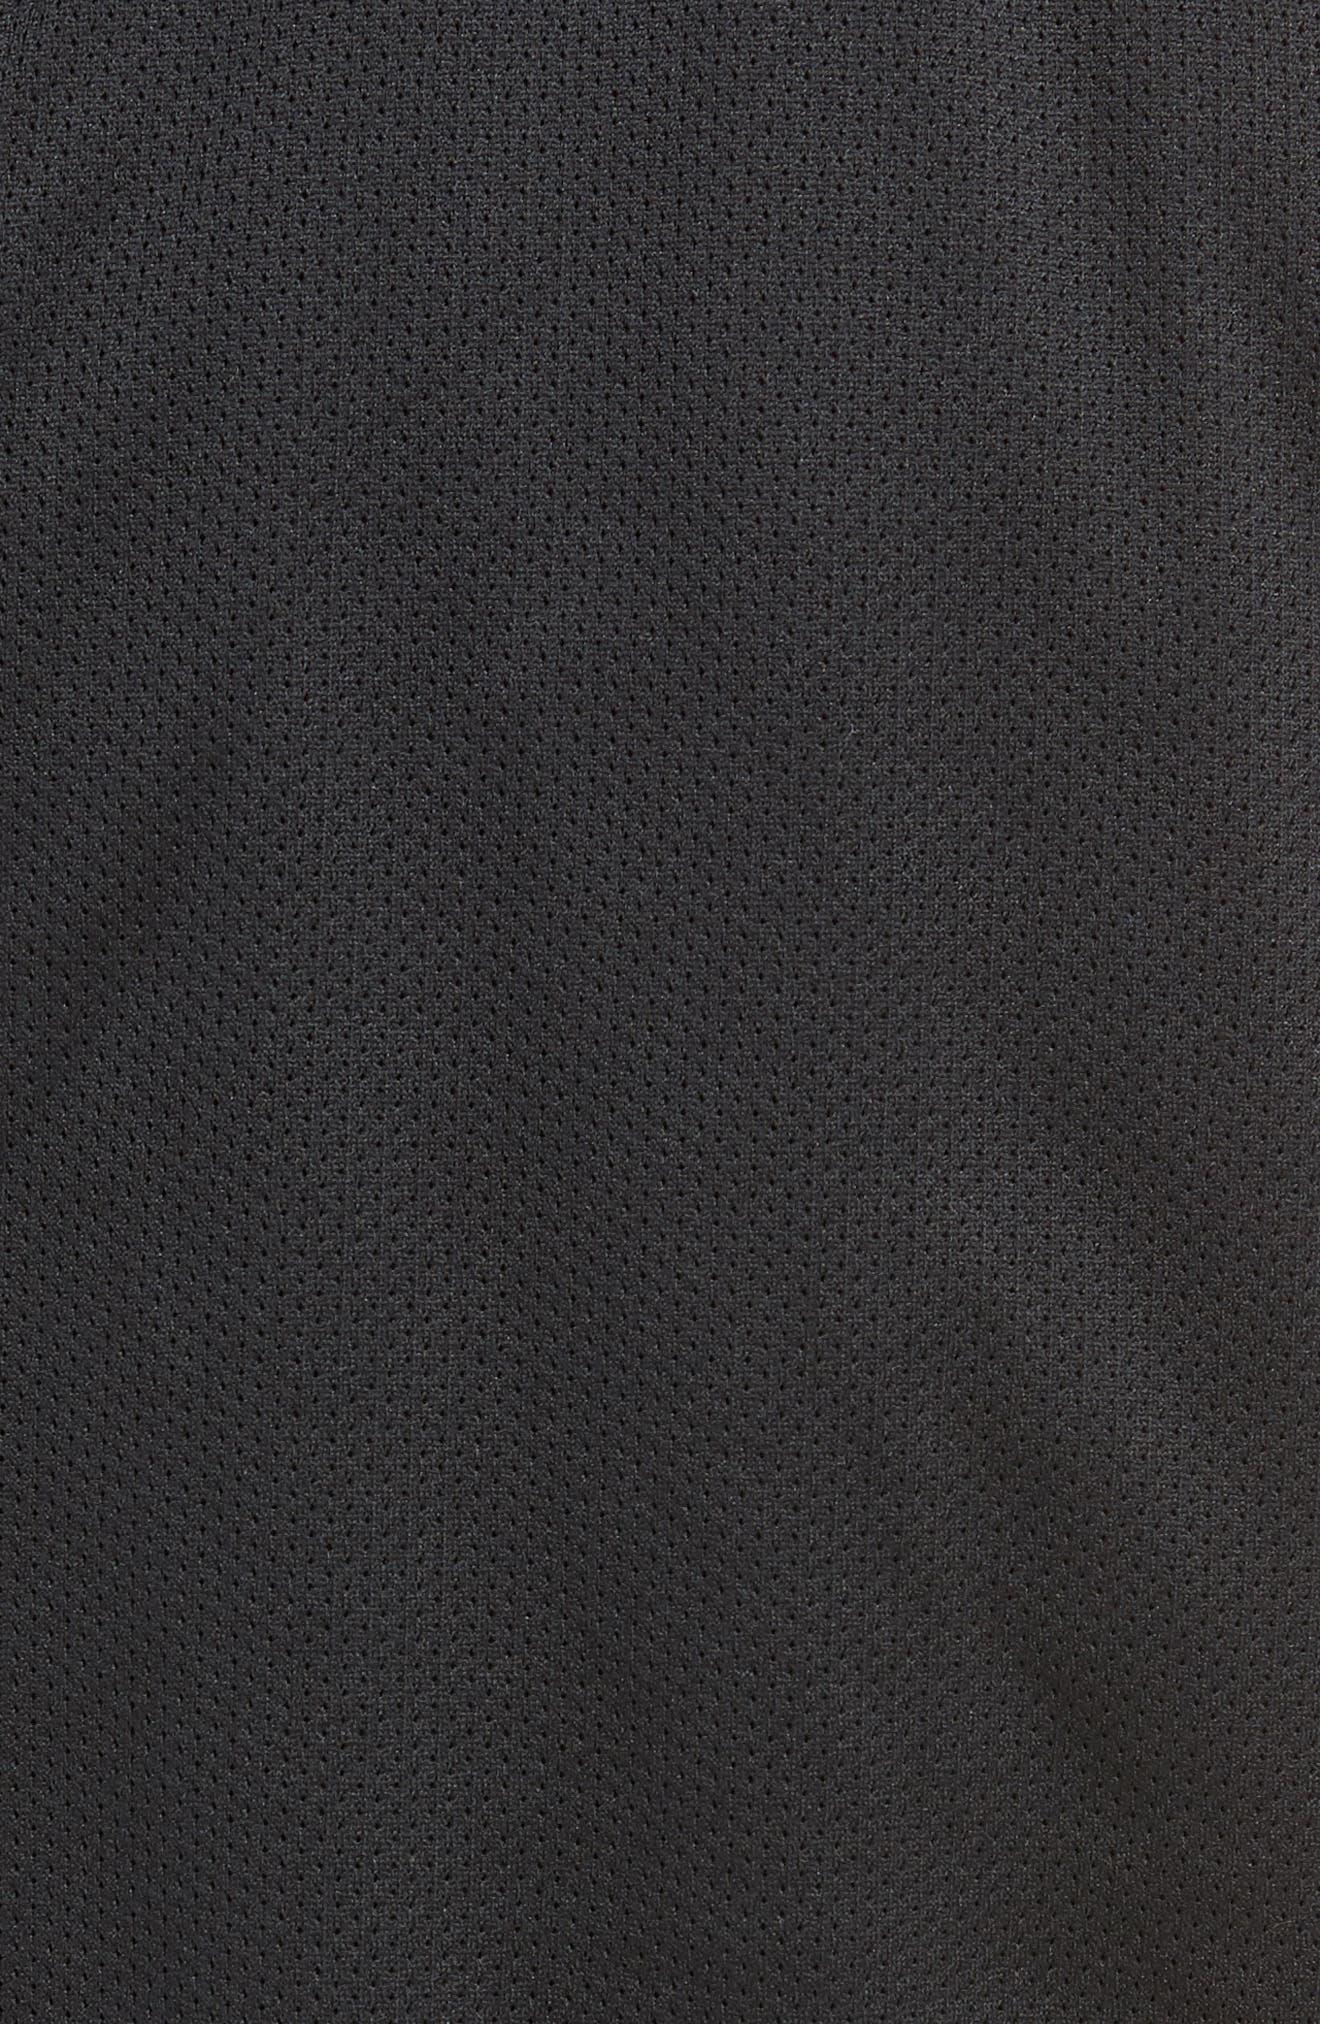 Lightweight Basketball Shorts,                             Alternate thumbnail 5, color,                             001